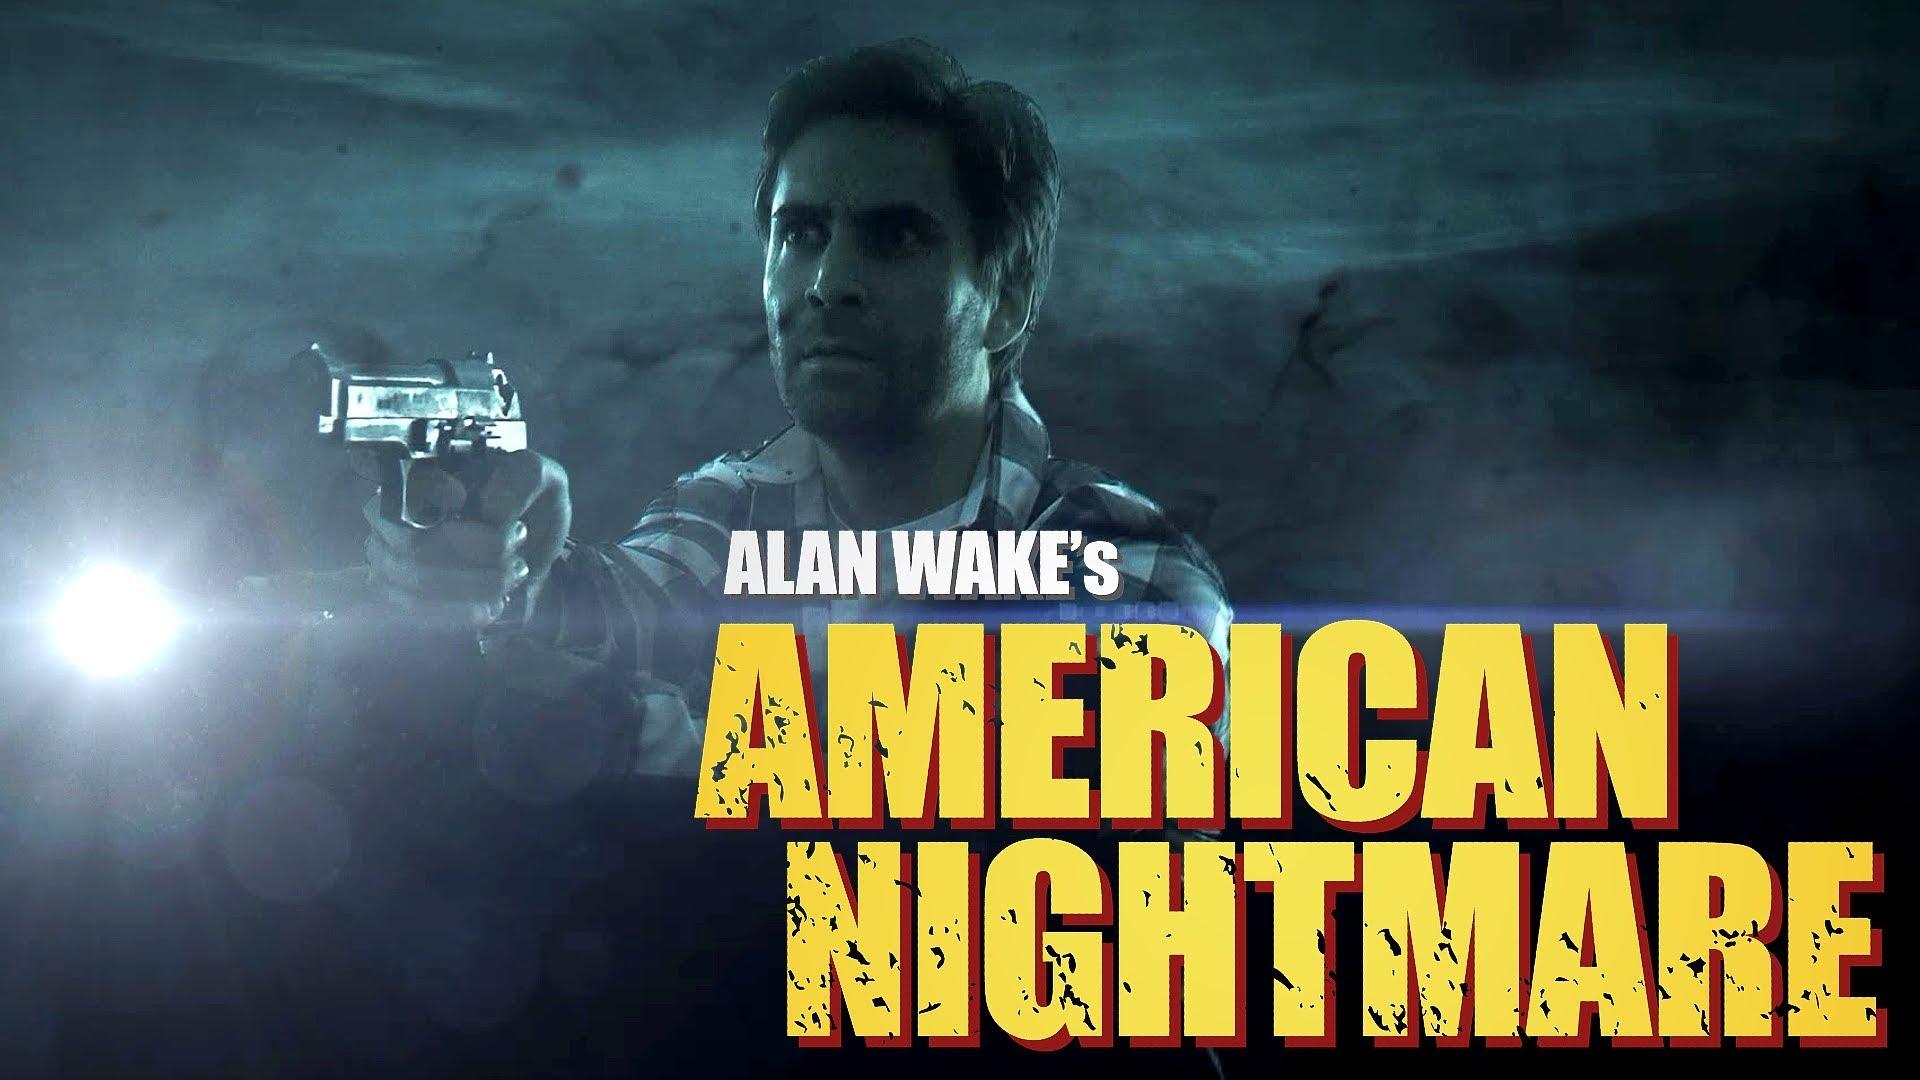 1920x1080 > Alan Wake's American Nightmare Wallpapers